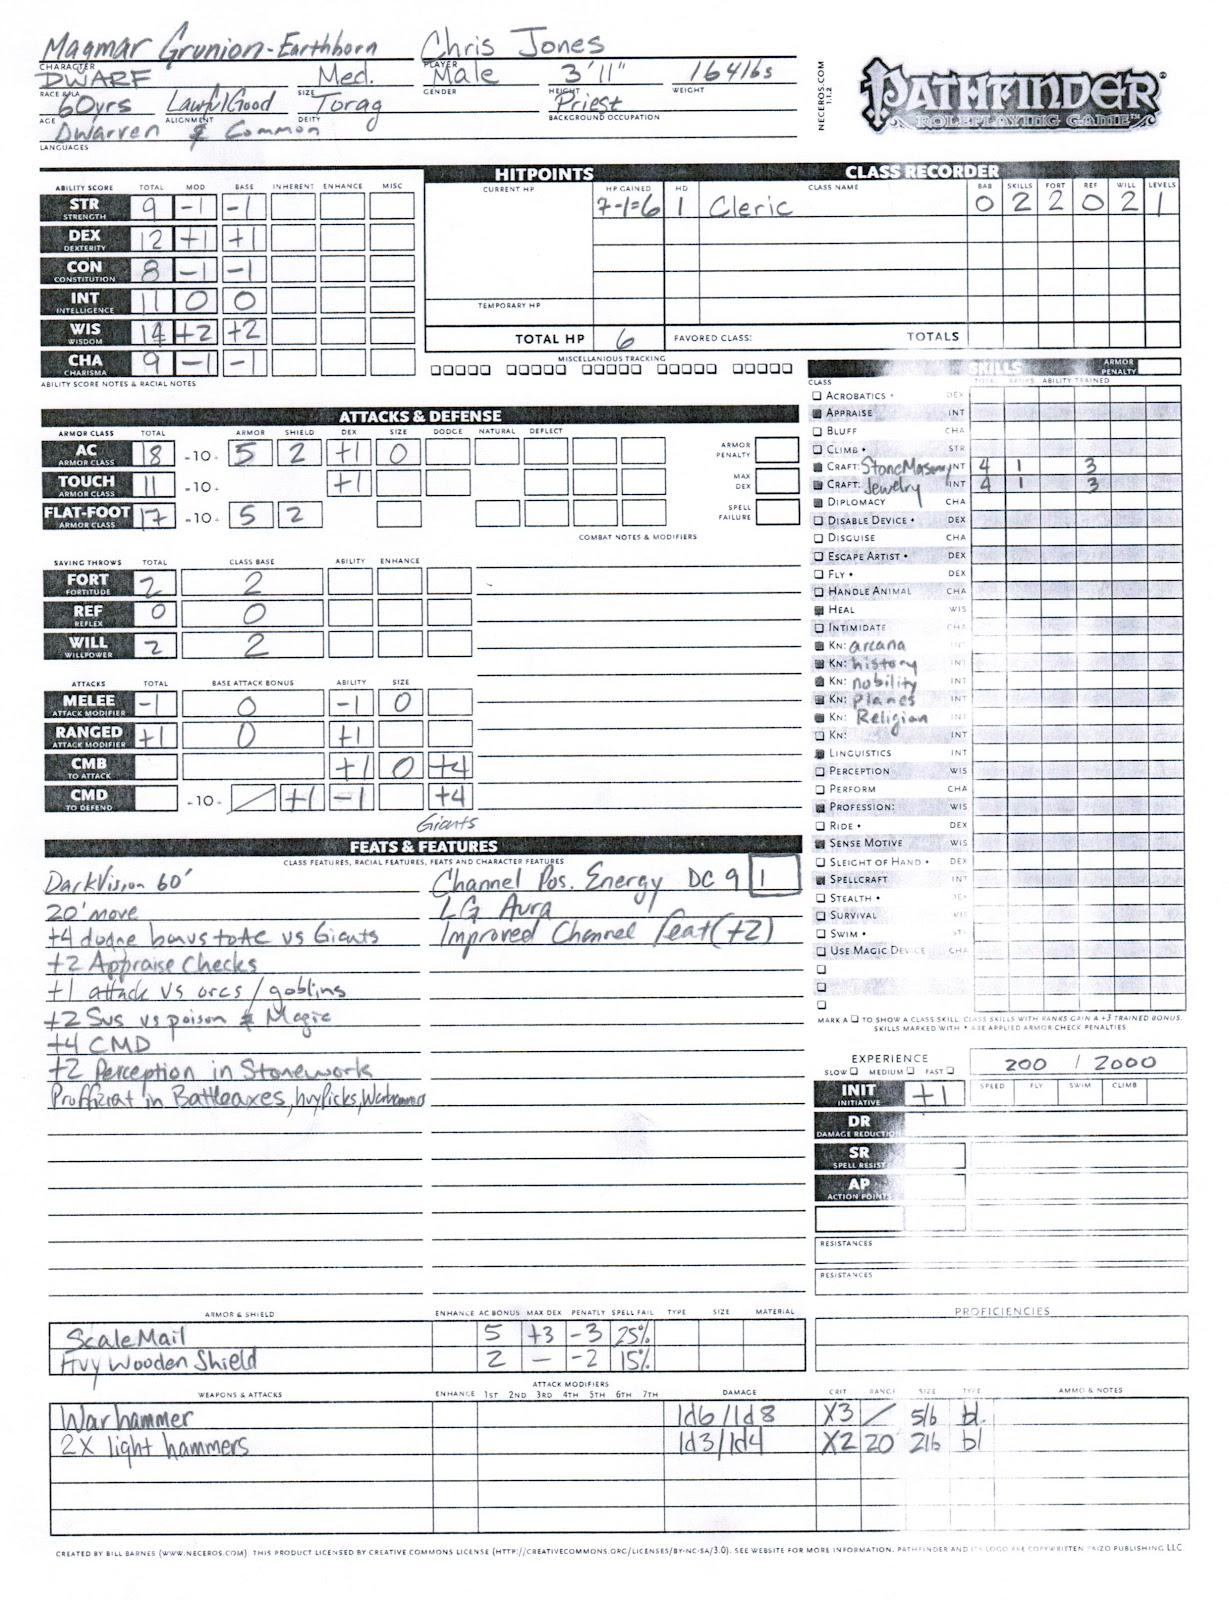 Pathfinder Character Sheet Paizo Pathfinder character sheet